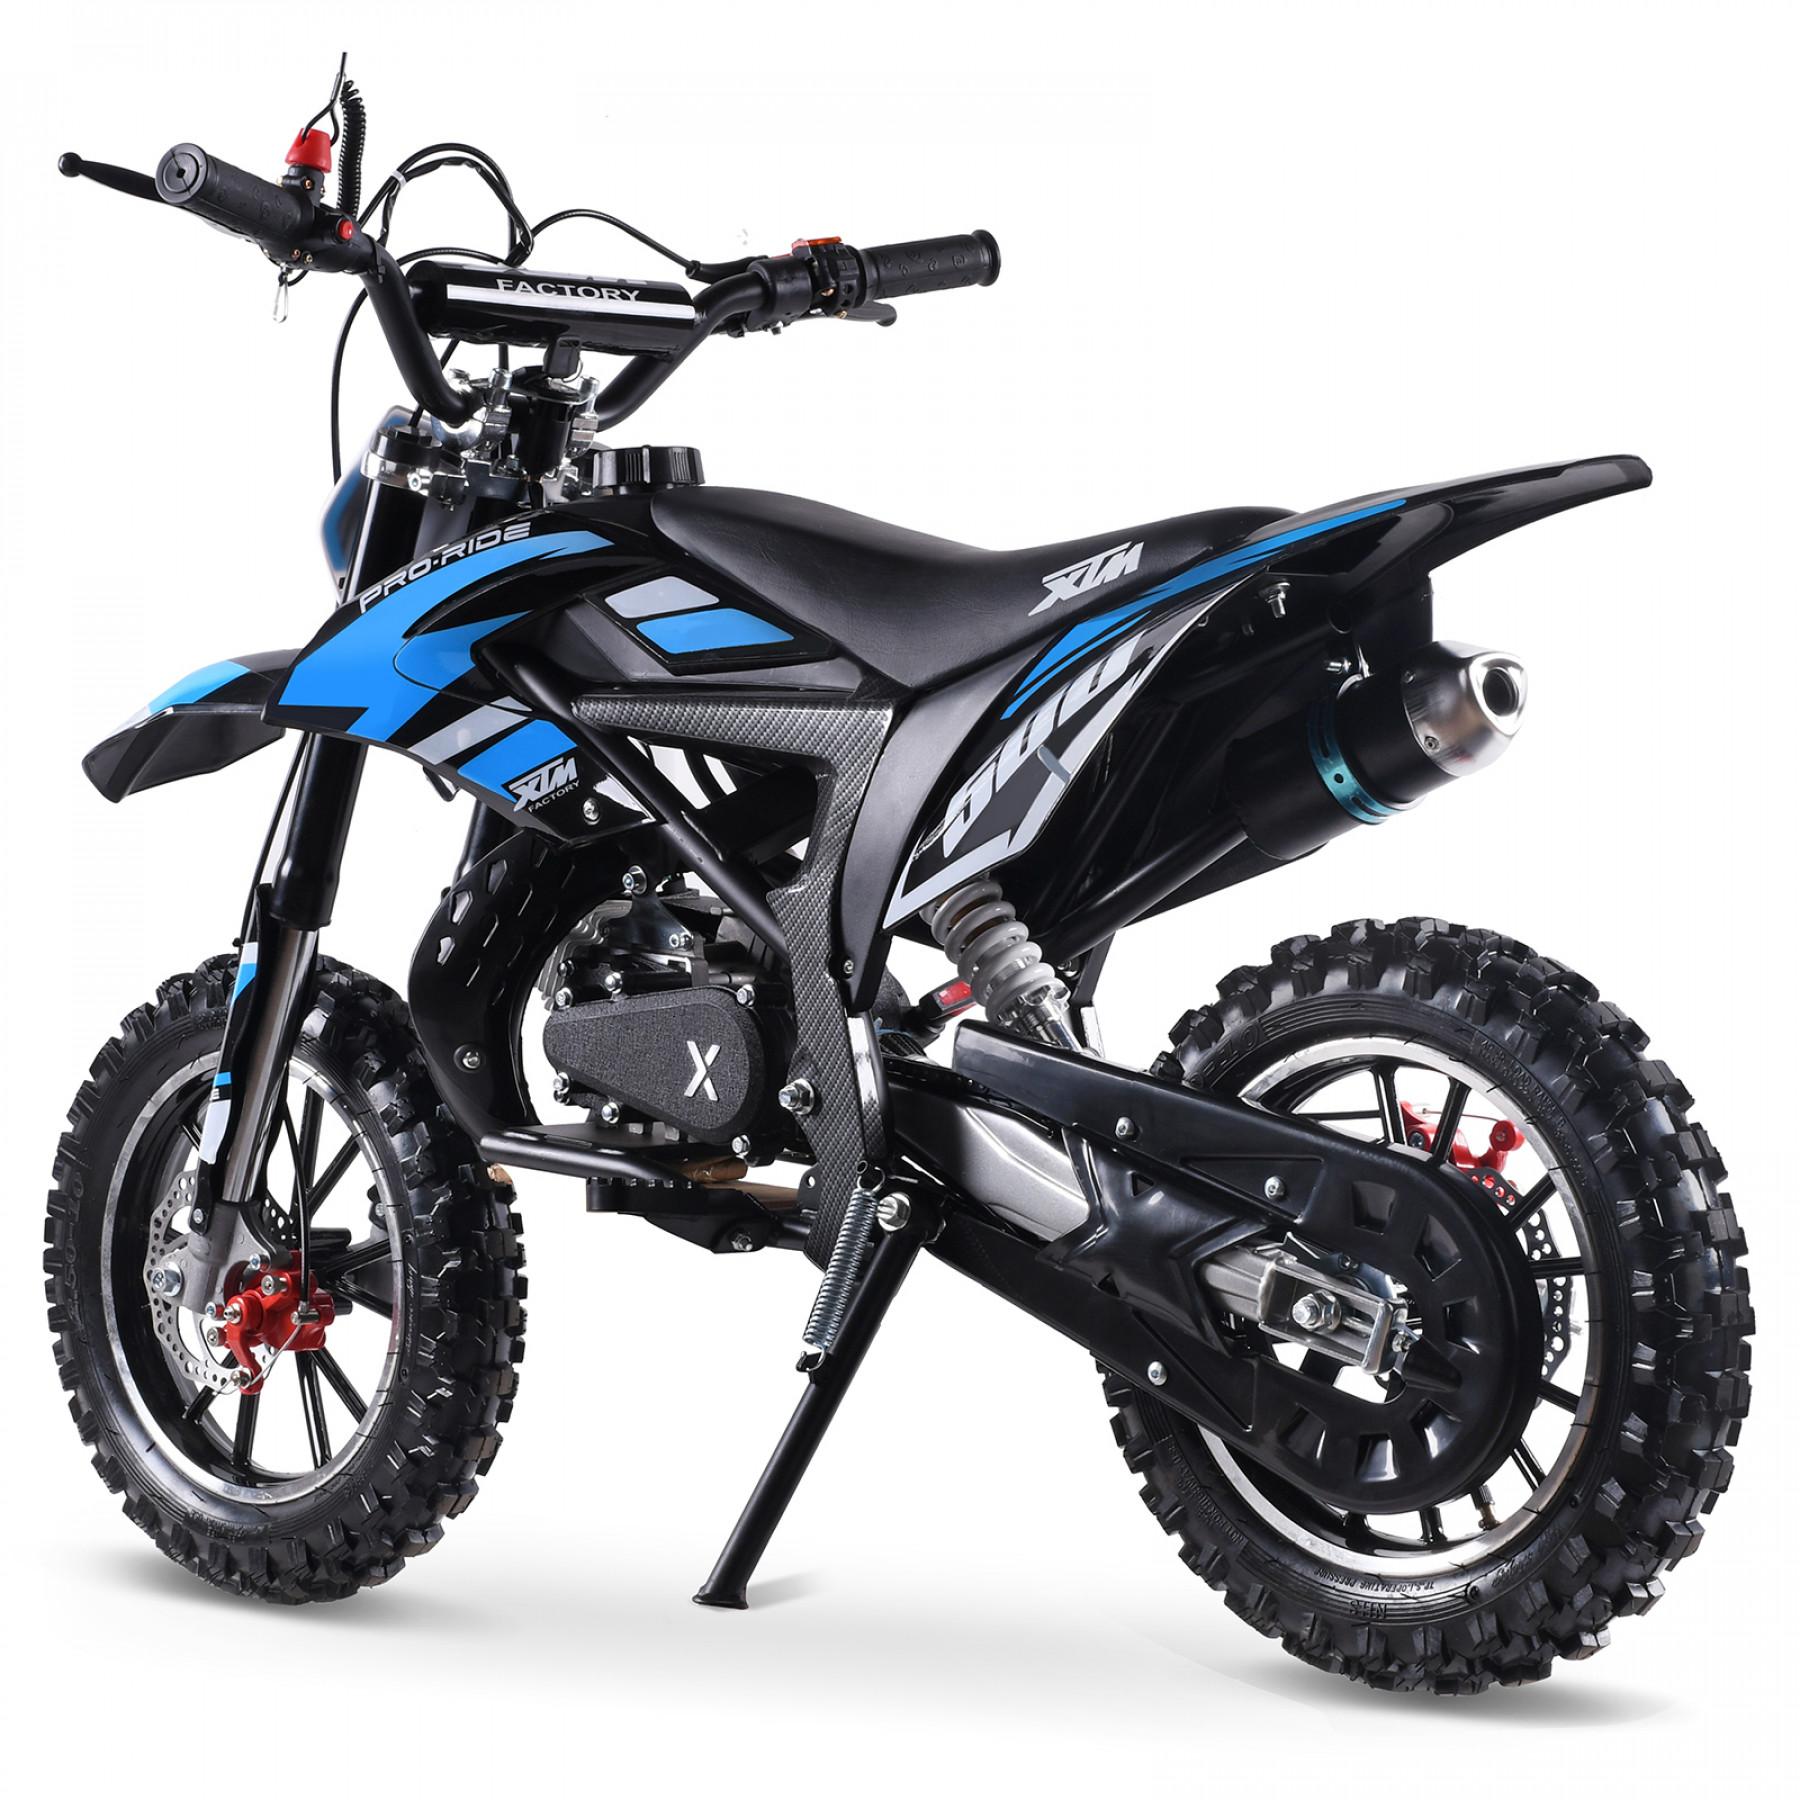 XTM PRO-RIDER 50cc DIRT BIKE BLACK BLUE